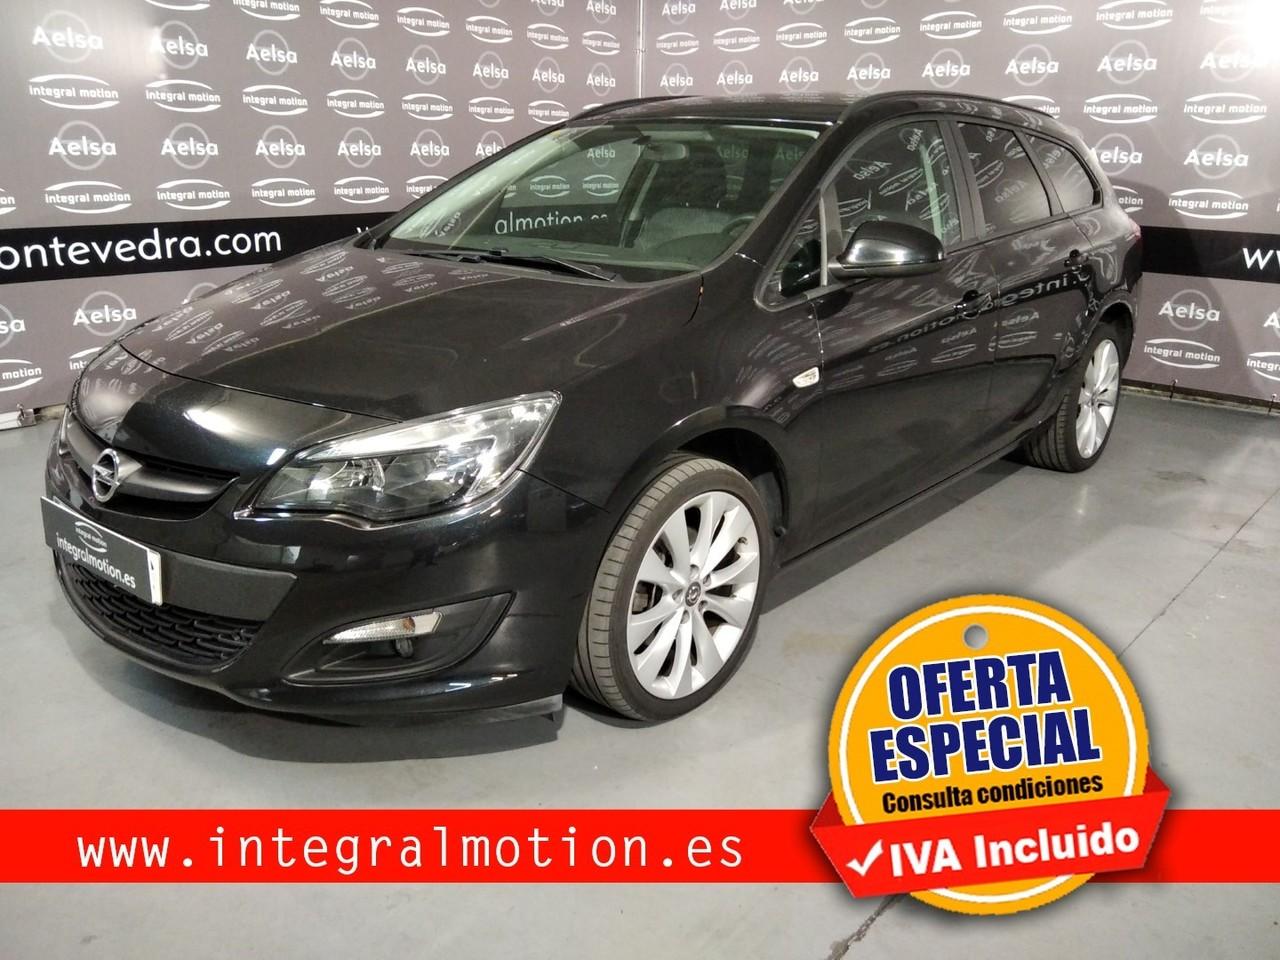 Opel Astra 1.7 CDTi S/S 110 CV Selective ST  - Foto 1